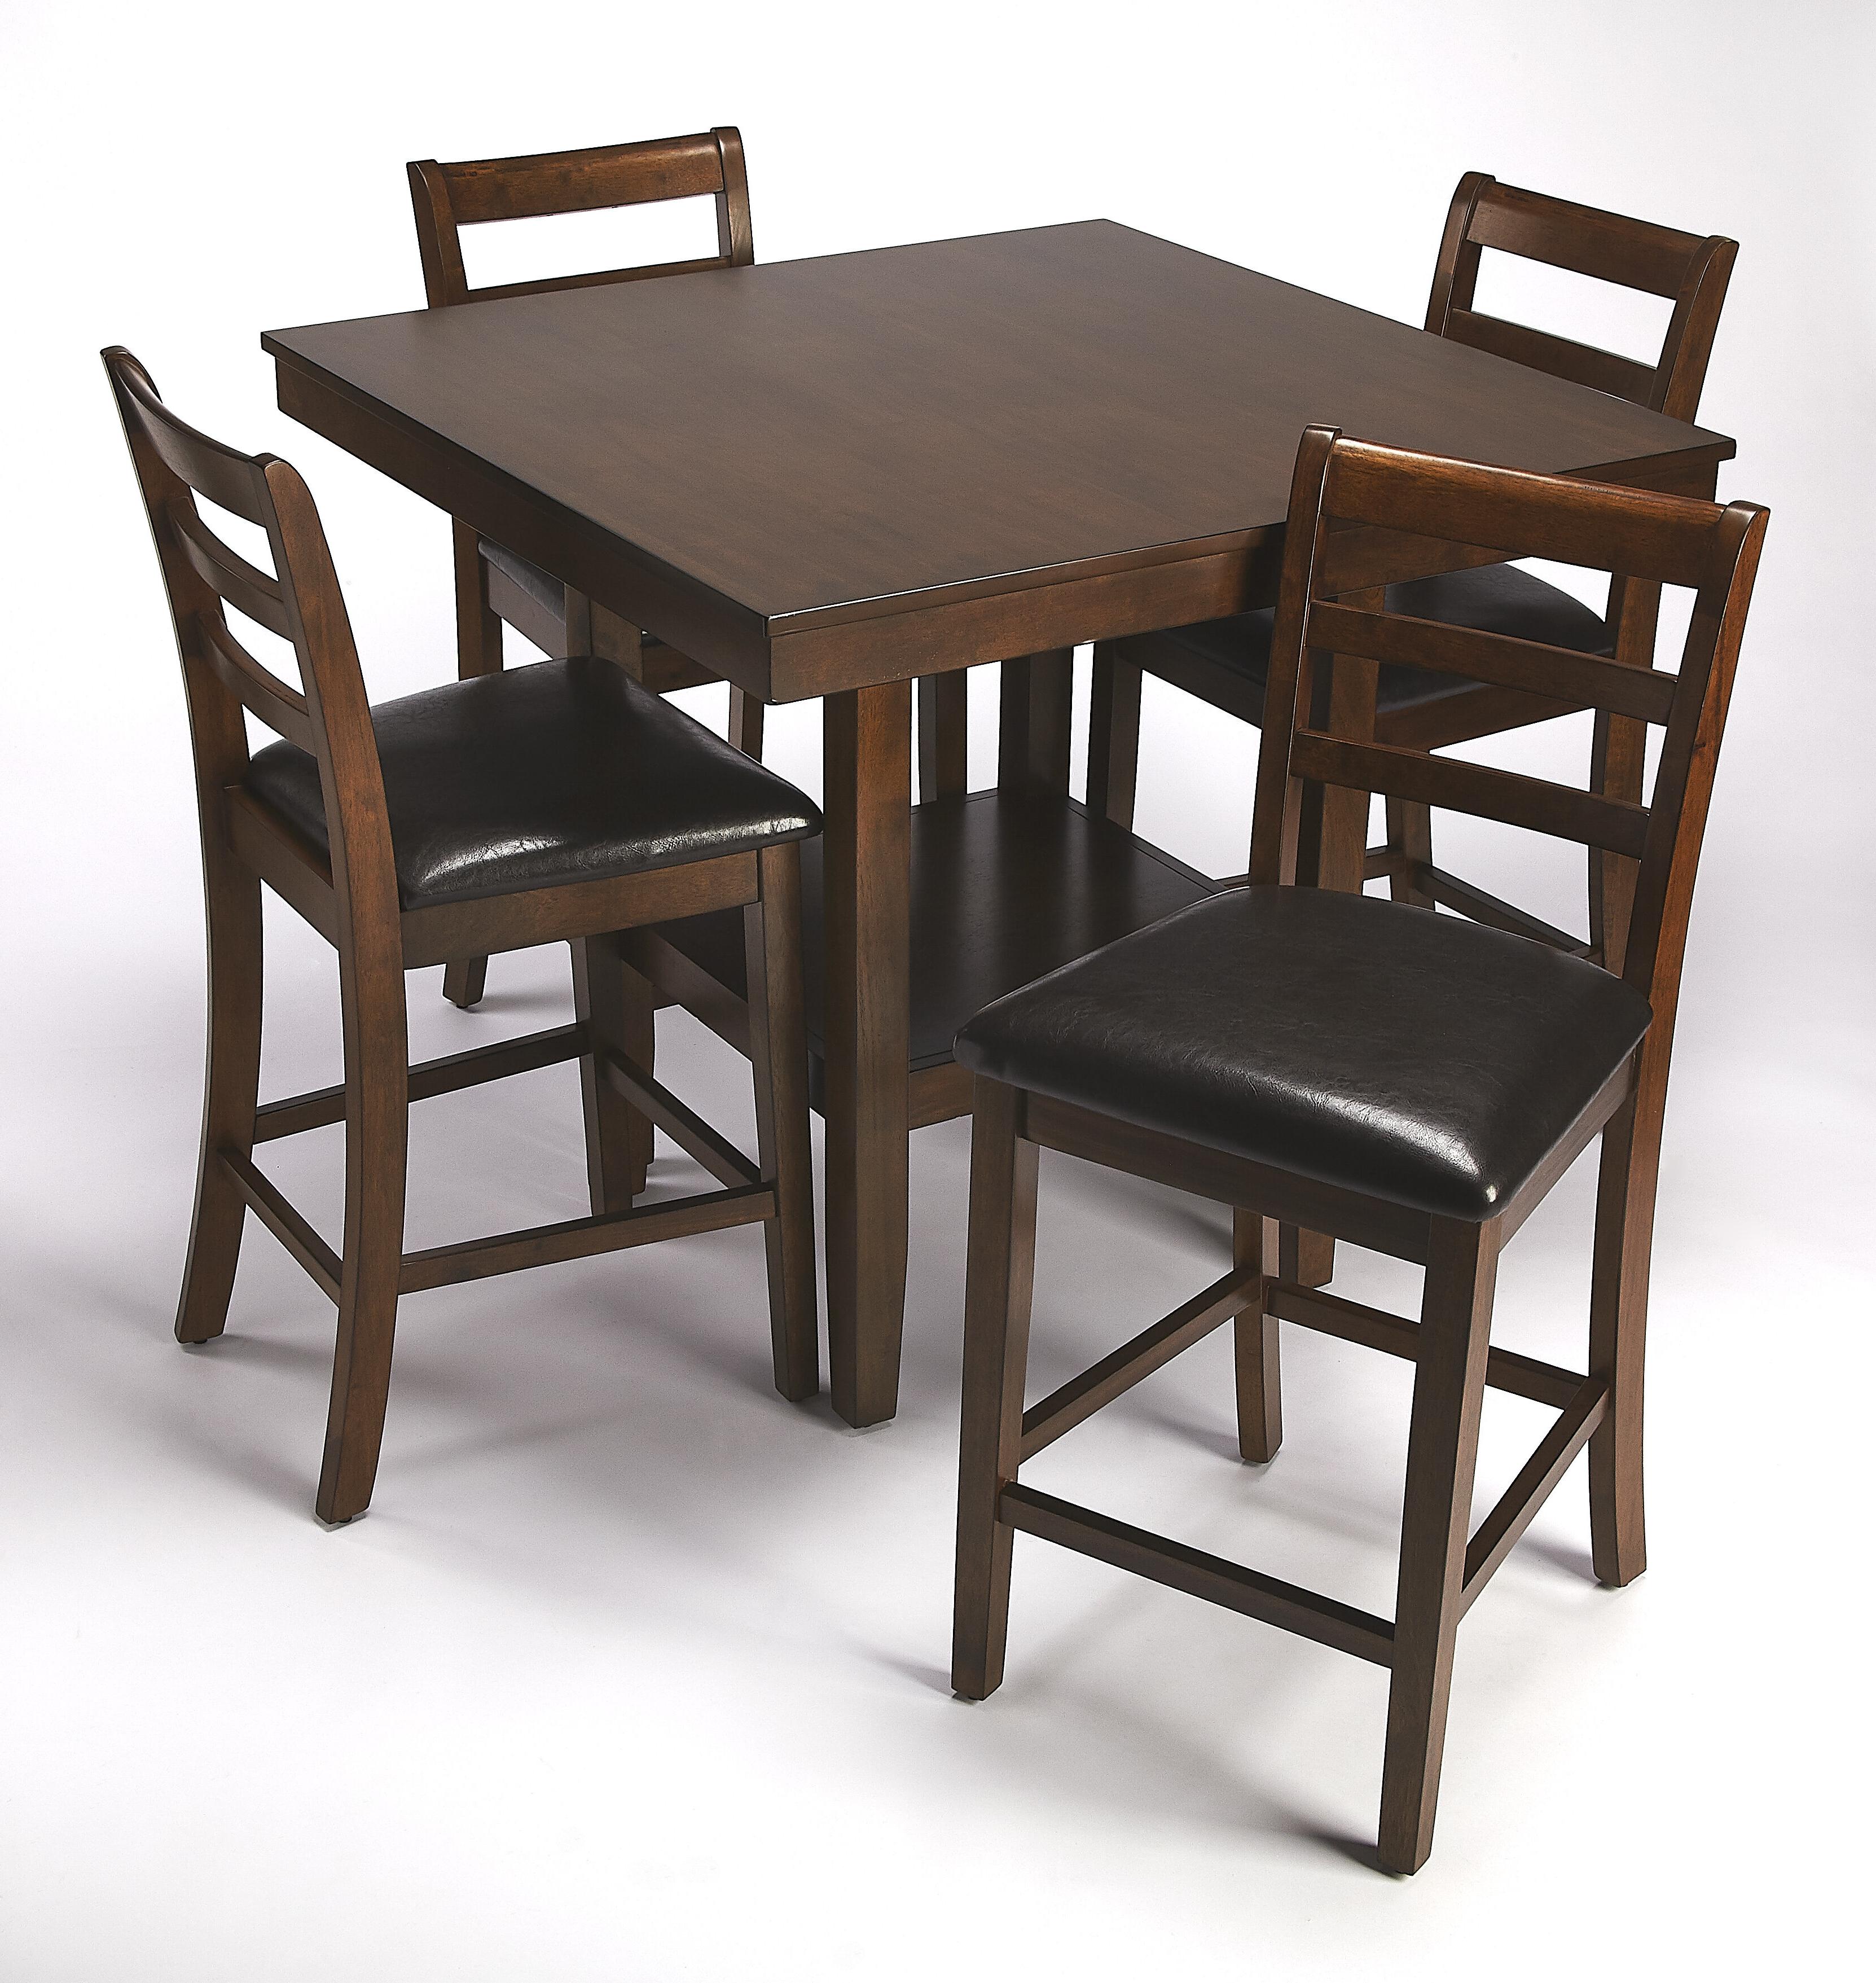 Sigler 5 Piece Dining Set Regarding Most Recent Emmeline 5 Piece Breakfast Nook Dining Sets (View 16 of 20)